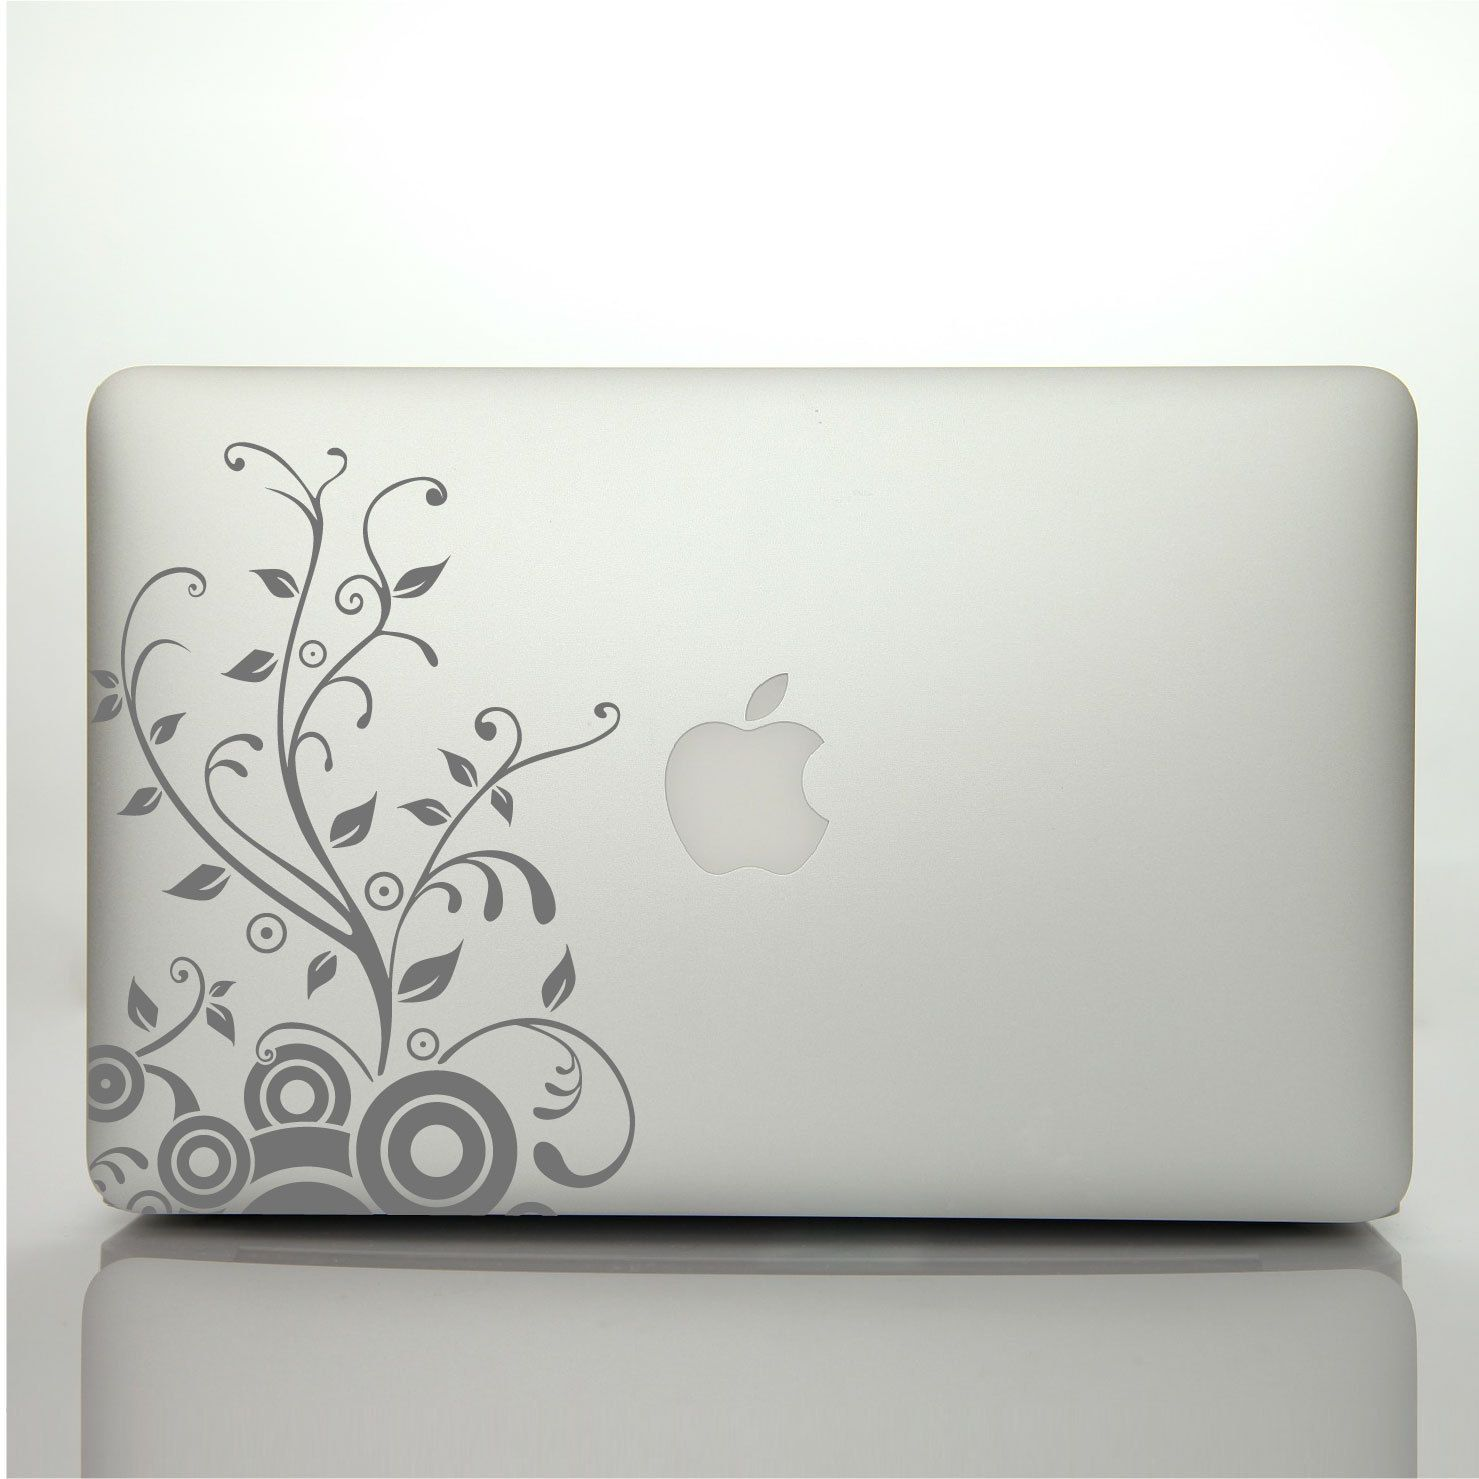 Custom Made Laptop Stickers   Arts - Arts